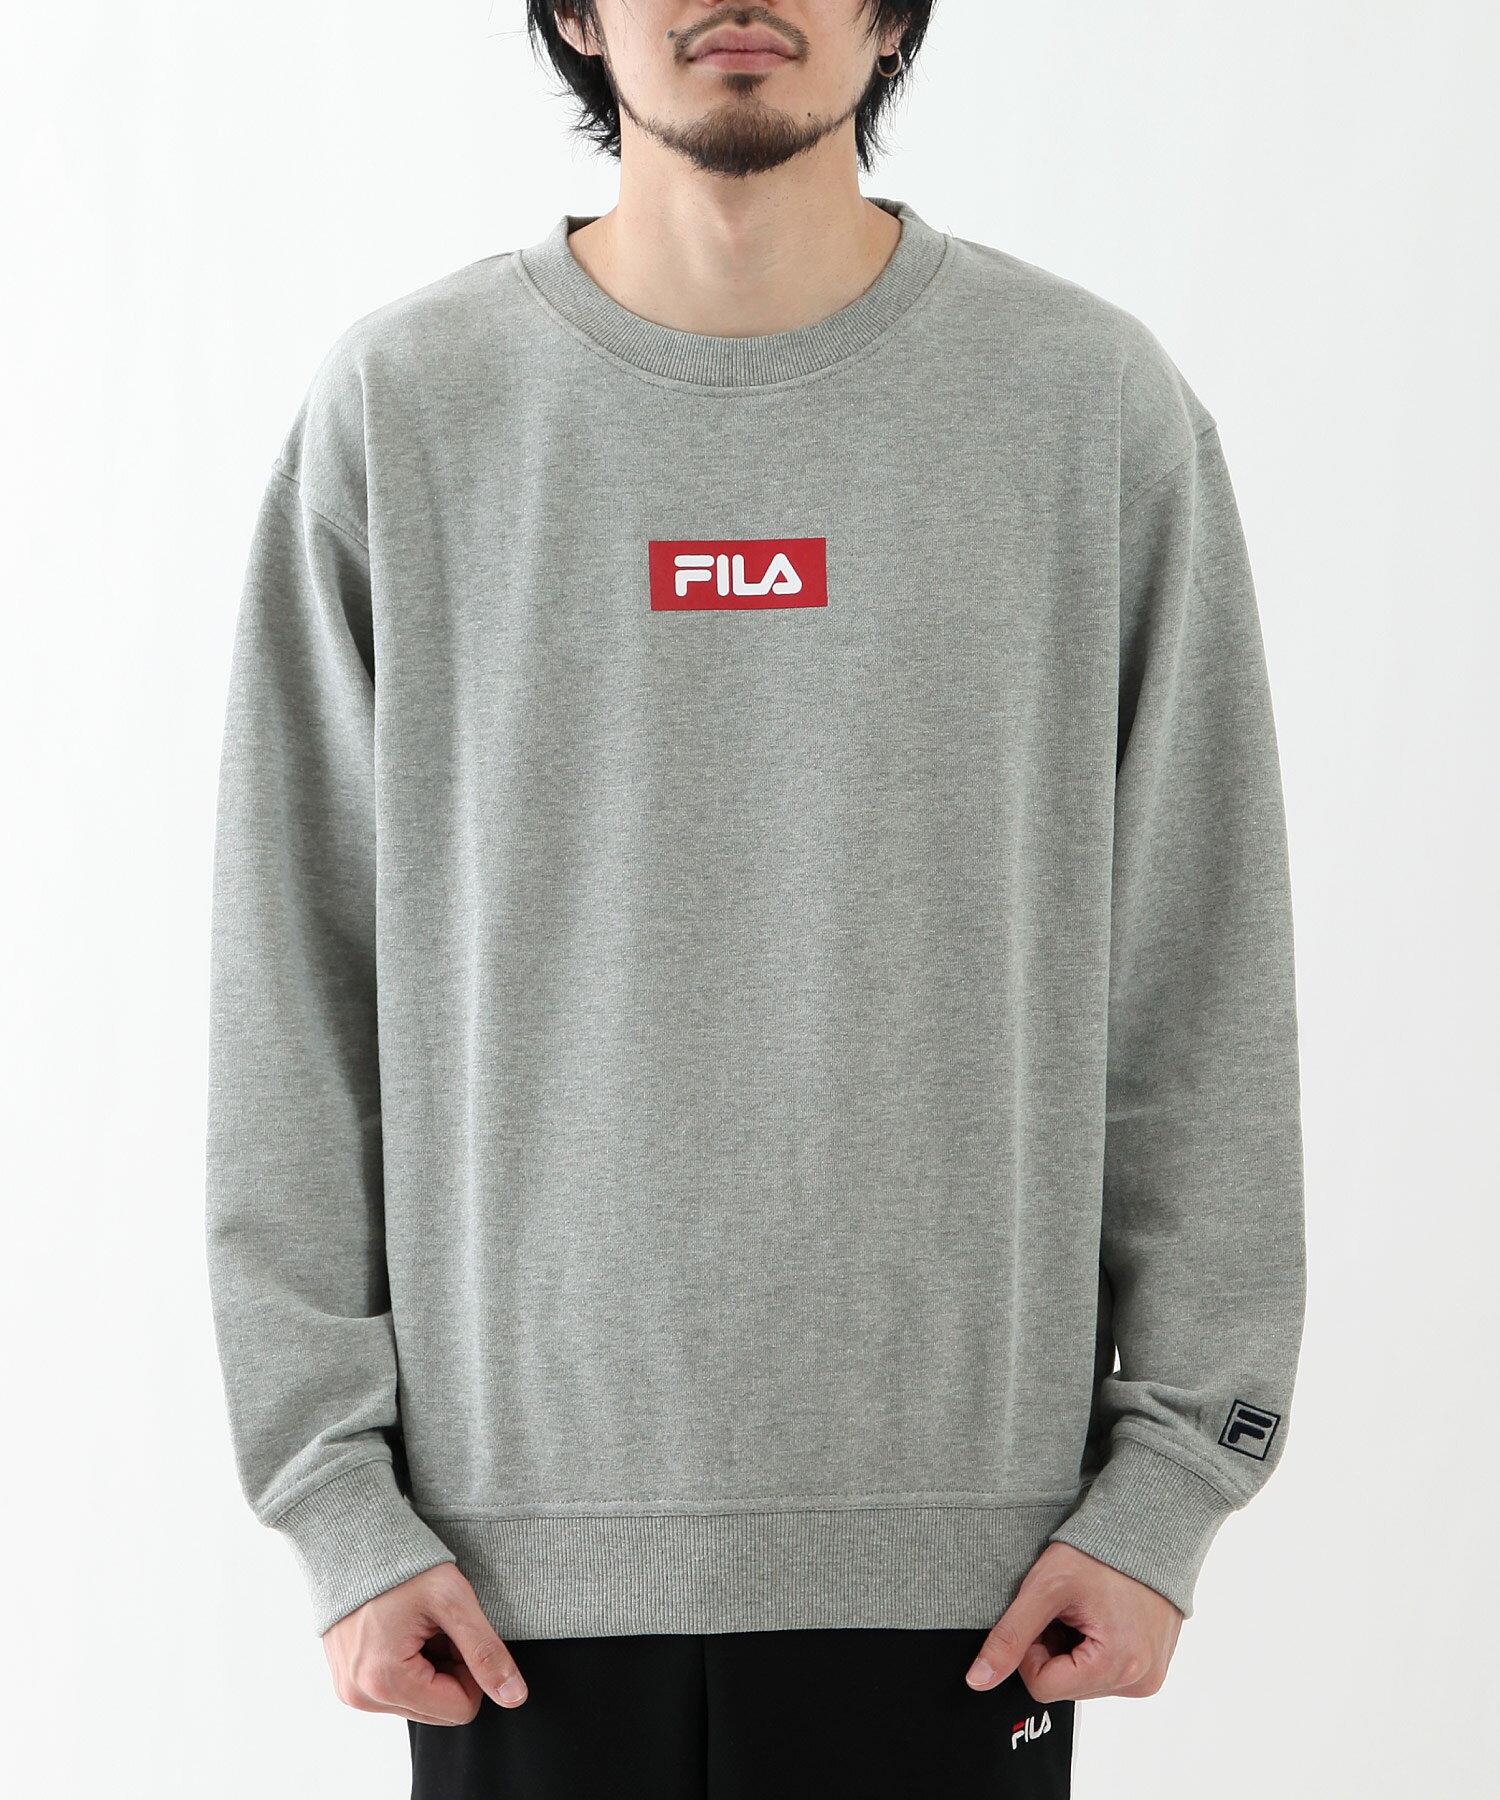 【FILA】方格LOGO運動衫 1